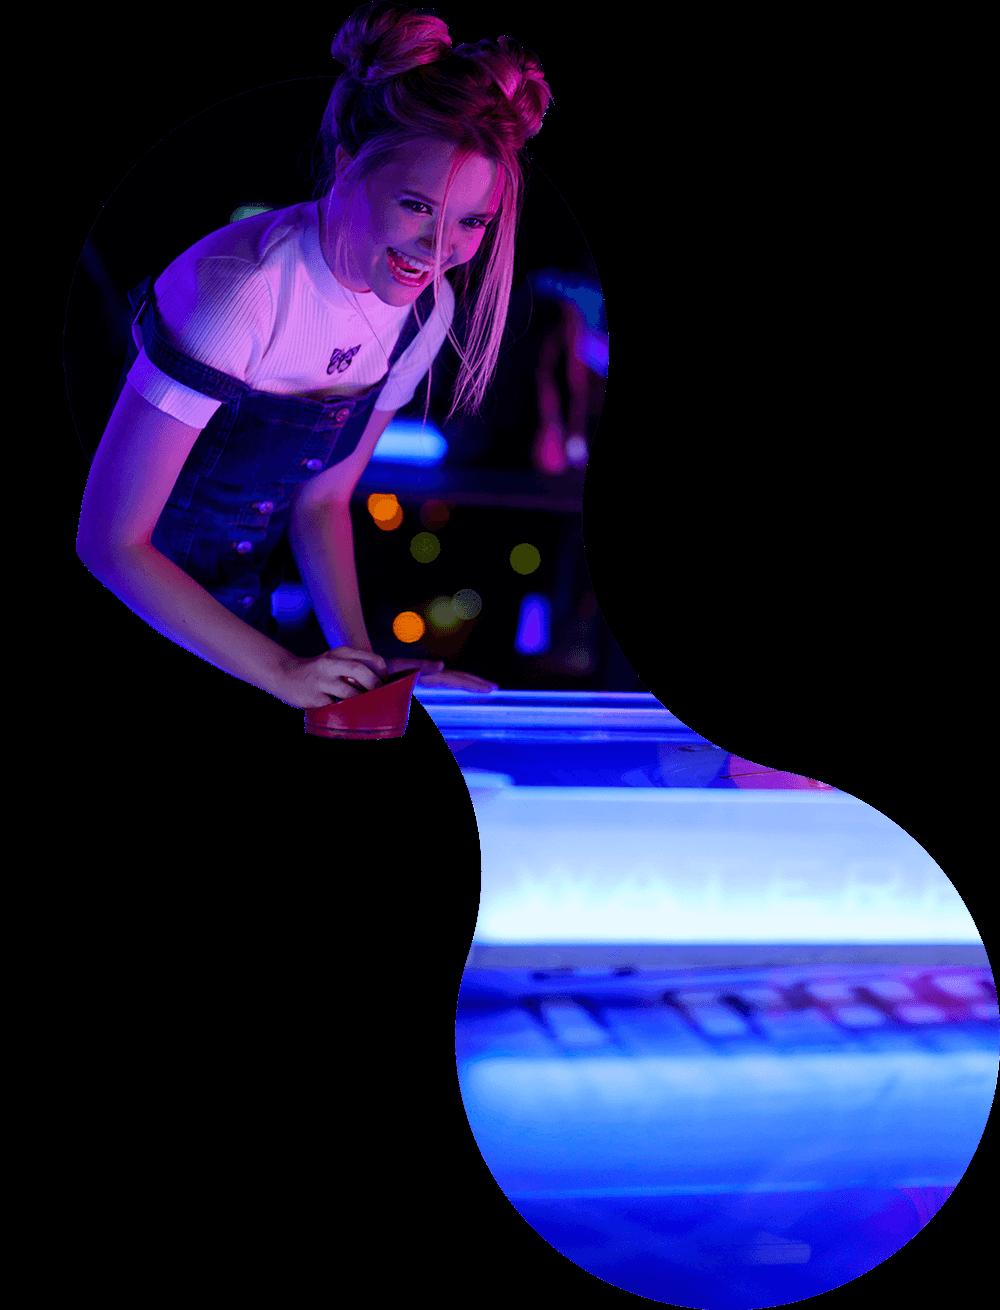 shuffleboard-bobbel-stock